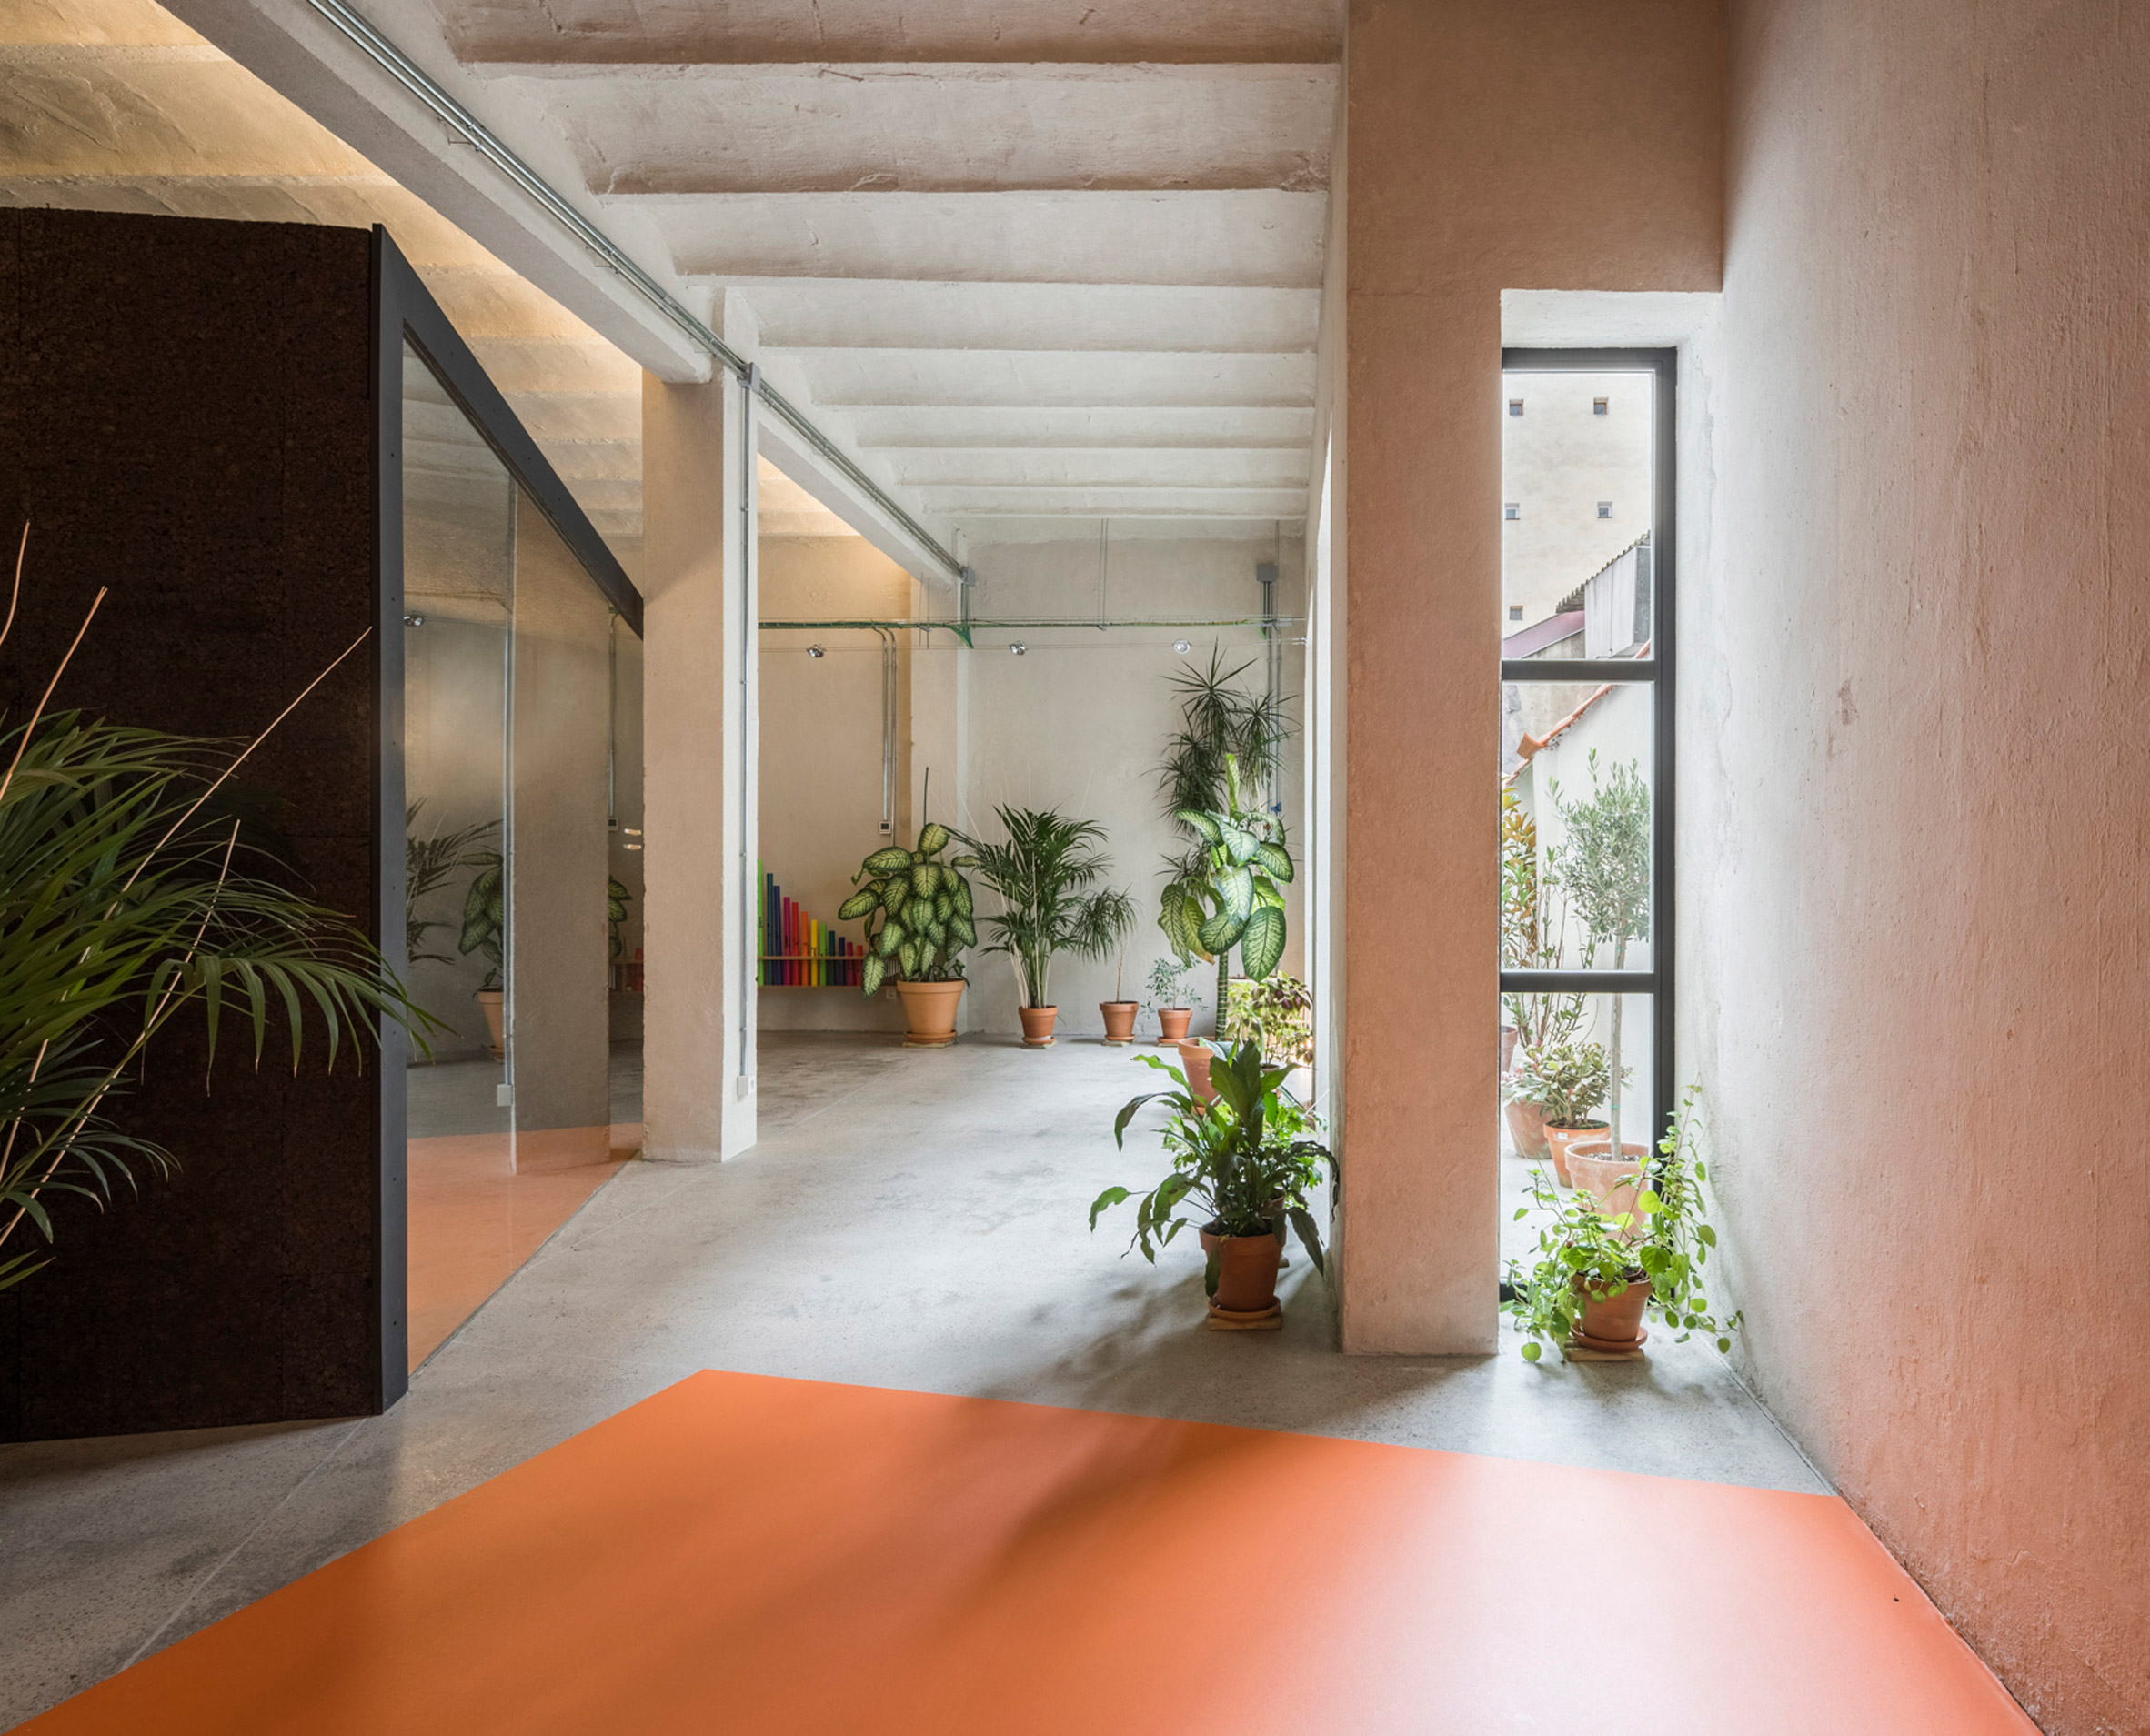 Classroom with orange vinyl flooring from the Yoglar Music School by Enrique Jerez and Blanca Leal